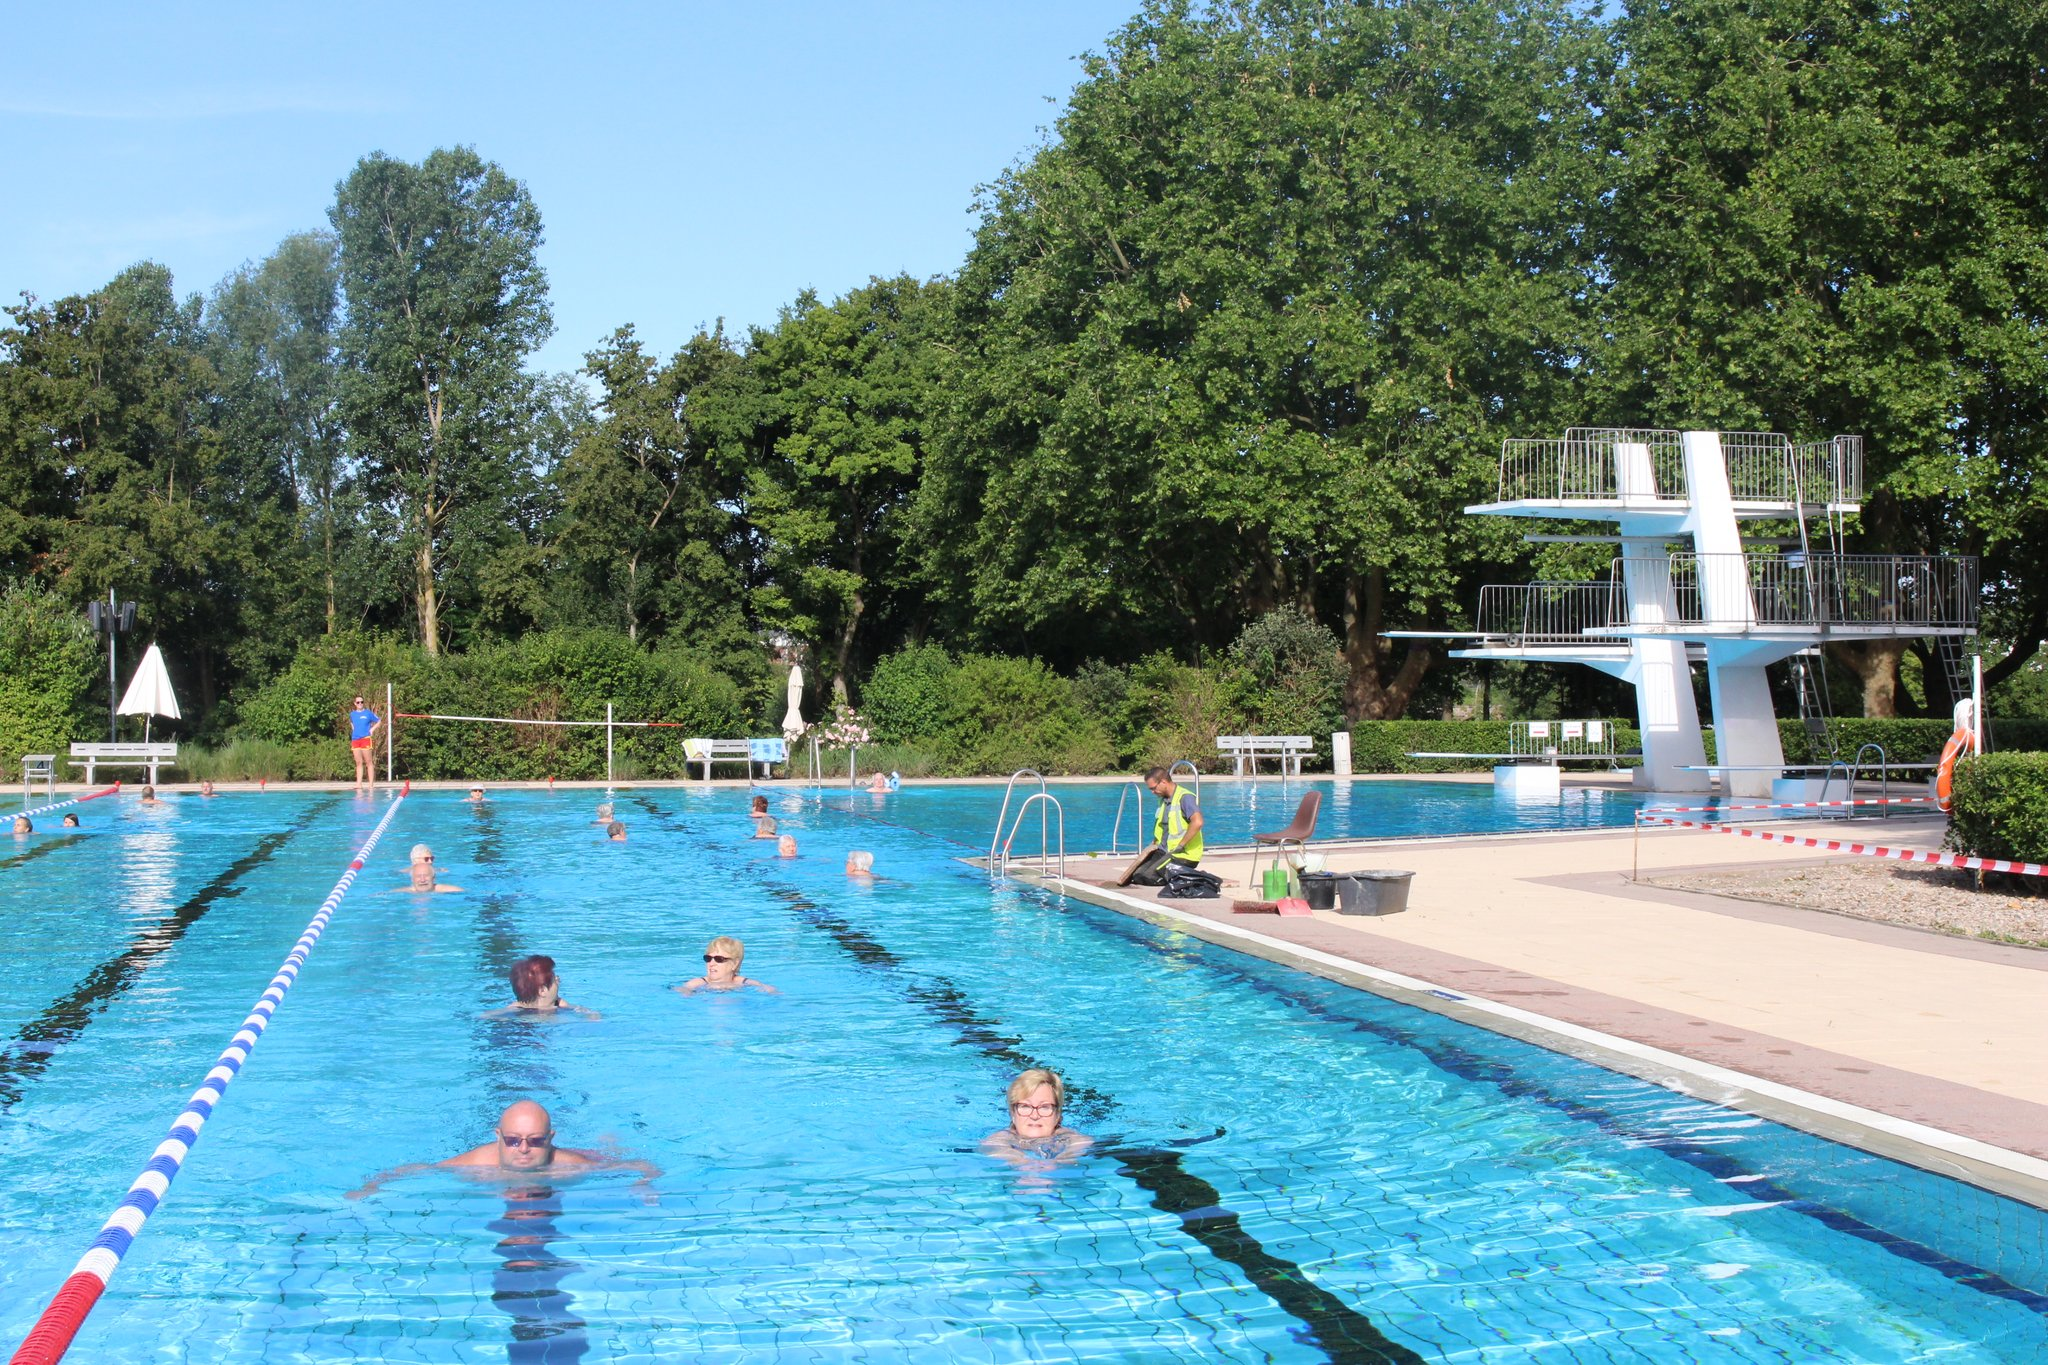 Corona Und Schwimmbad